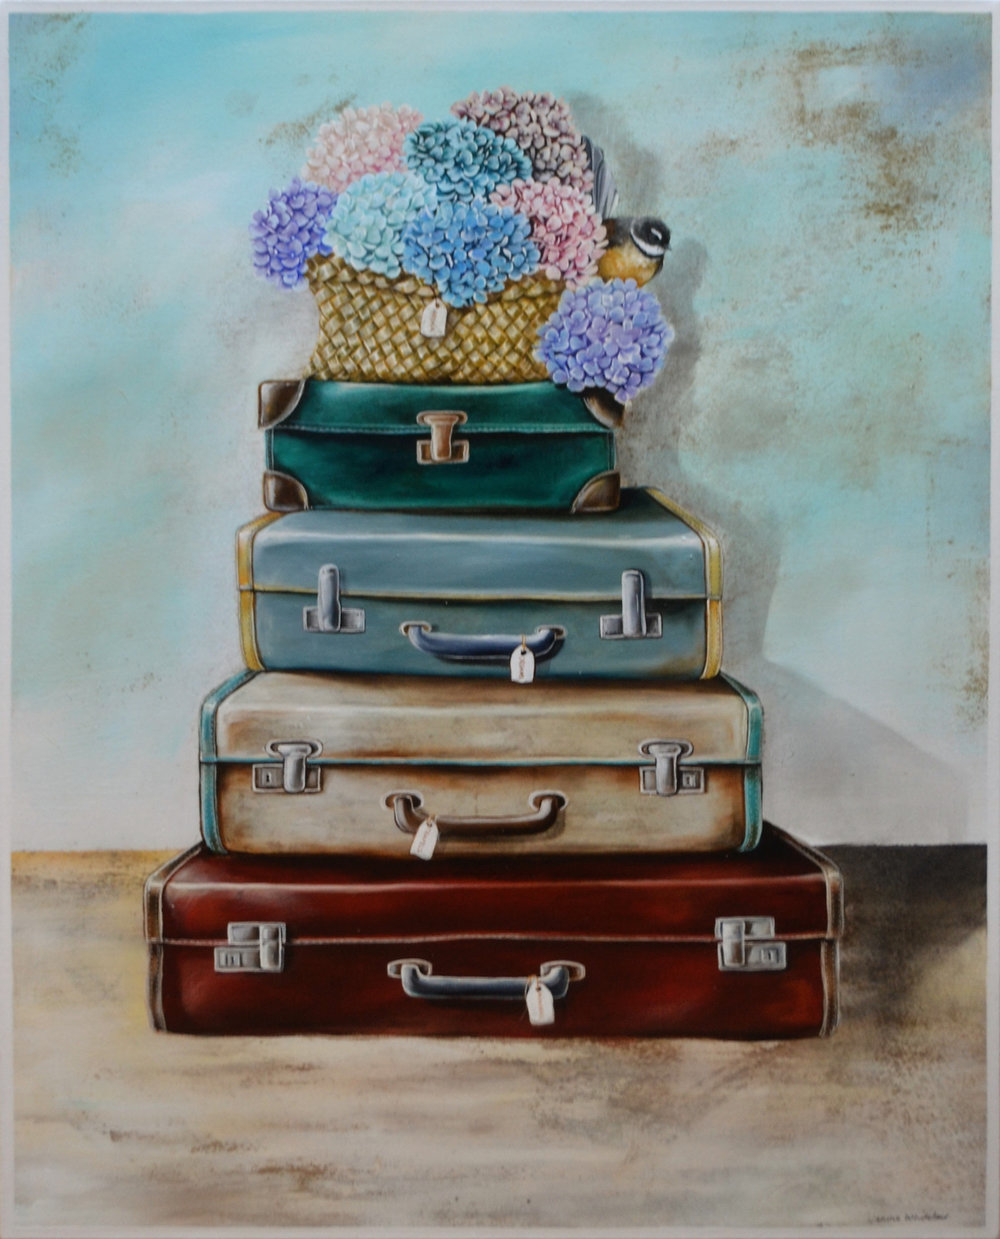 Treasured Memories  Janine Whitelaw, acrylic on canvas, 1000mm x 800mm  $2,000.00